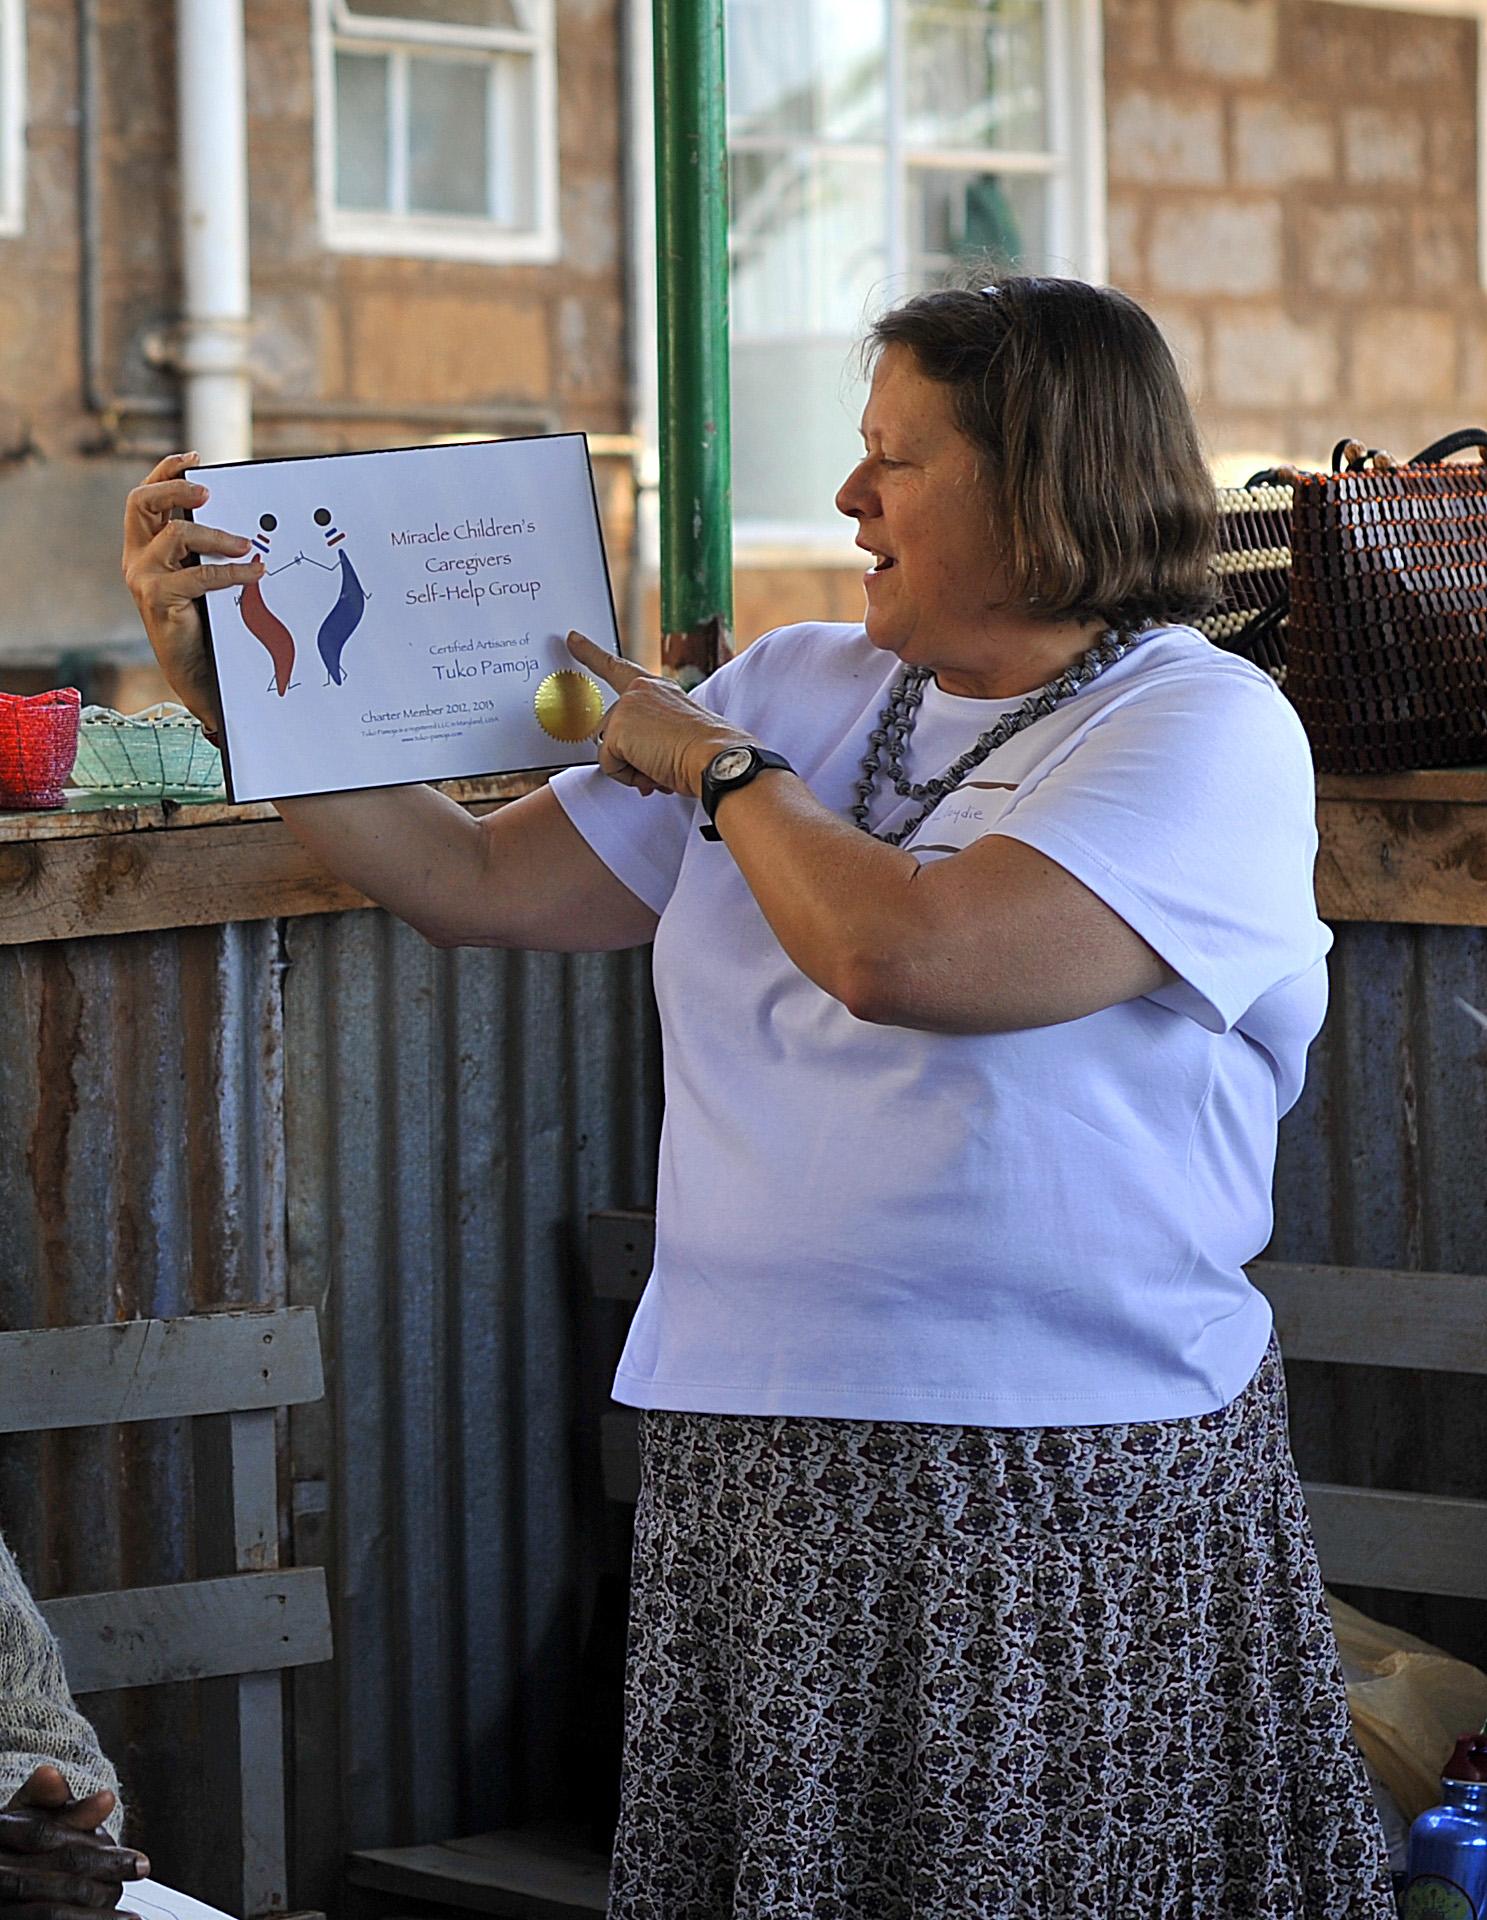 LLoydie showing the Tuko Pamoja certificate